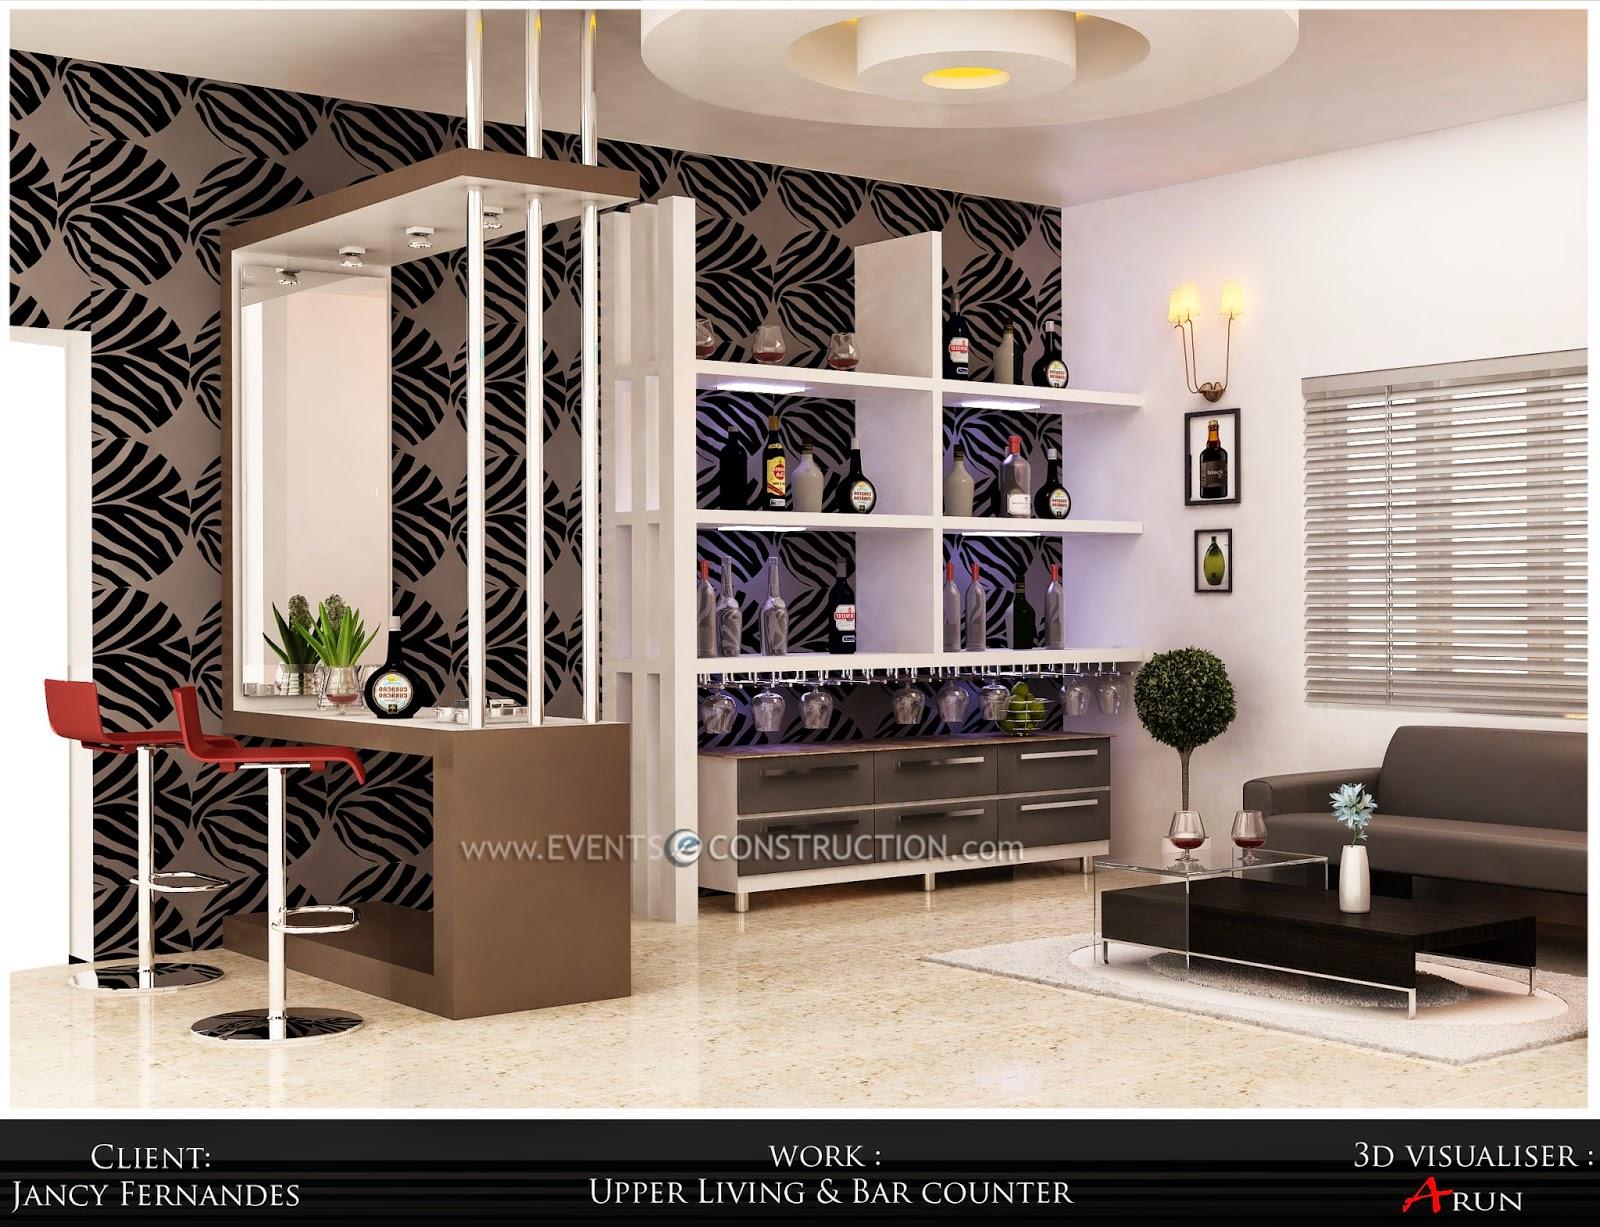 Evens Pvt Ltd Upper Living Room And Bar Counter.